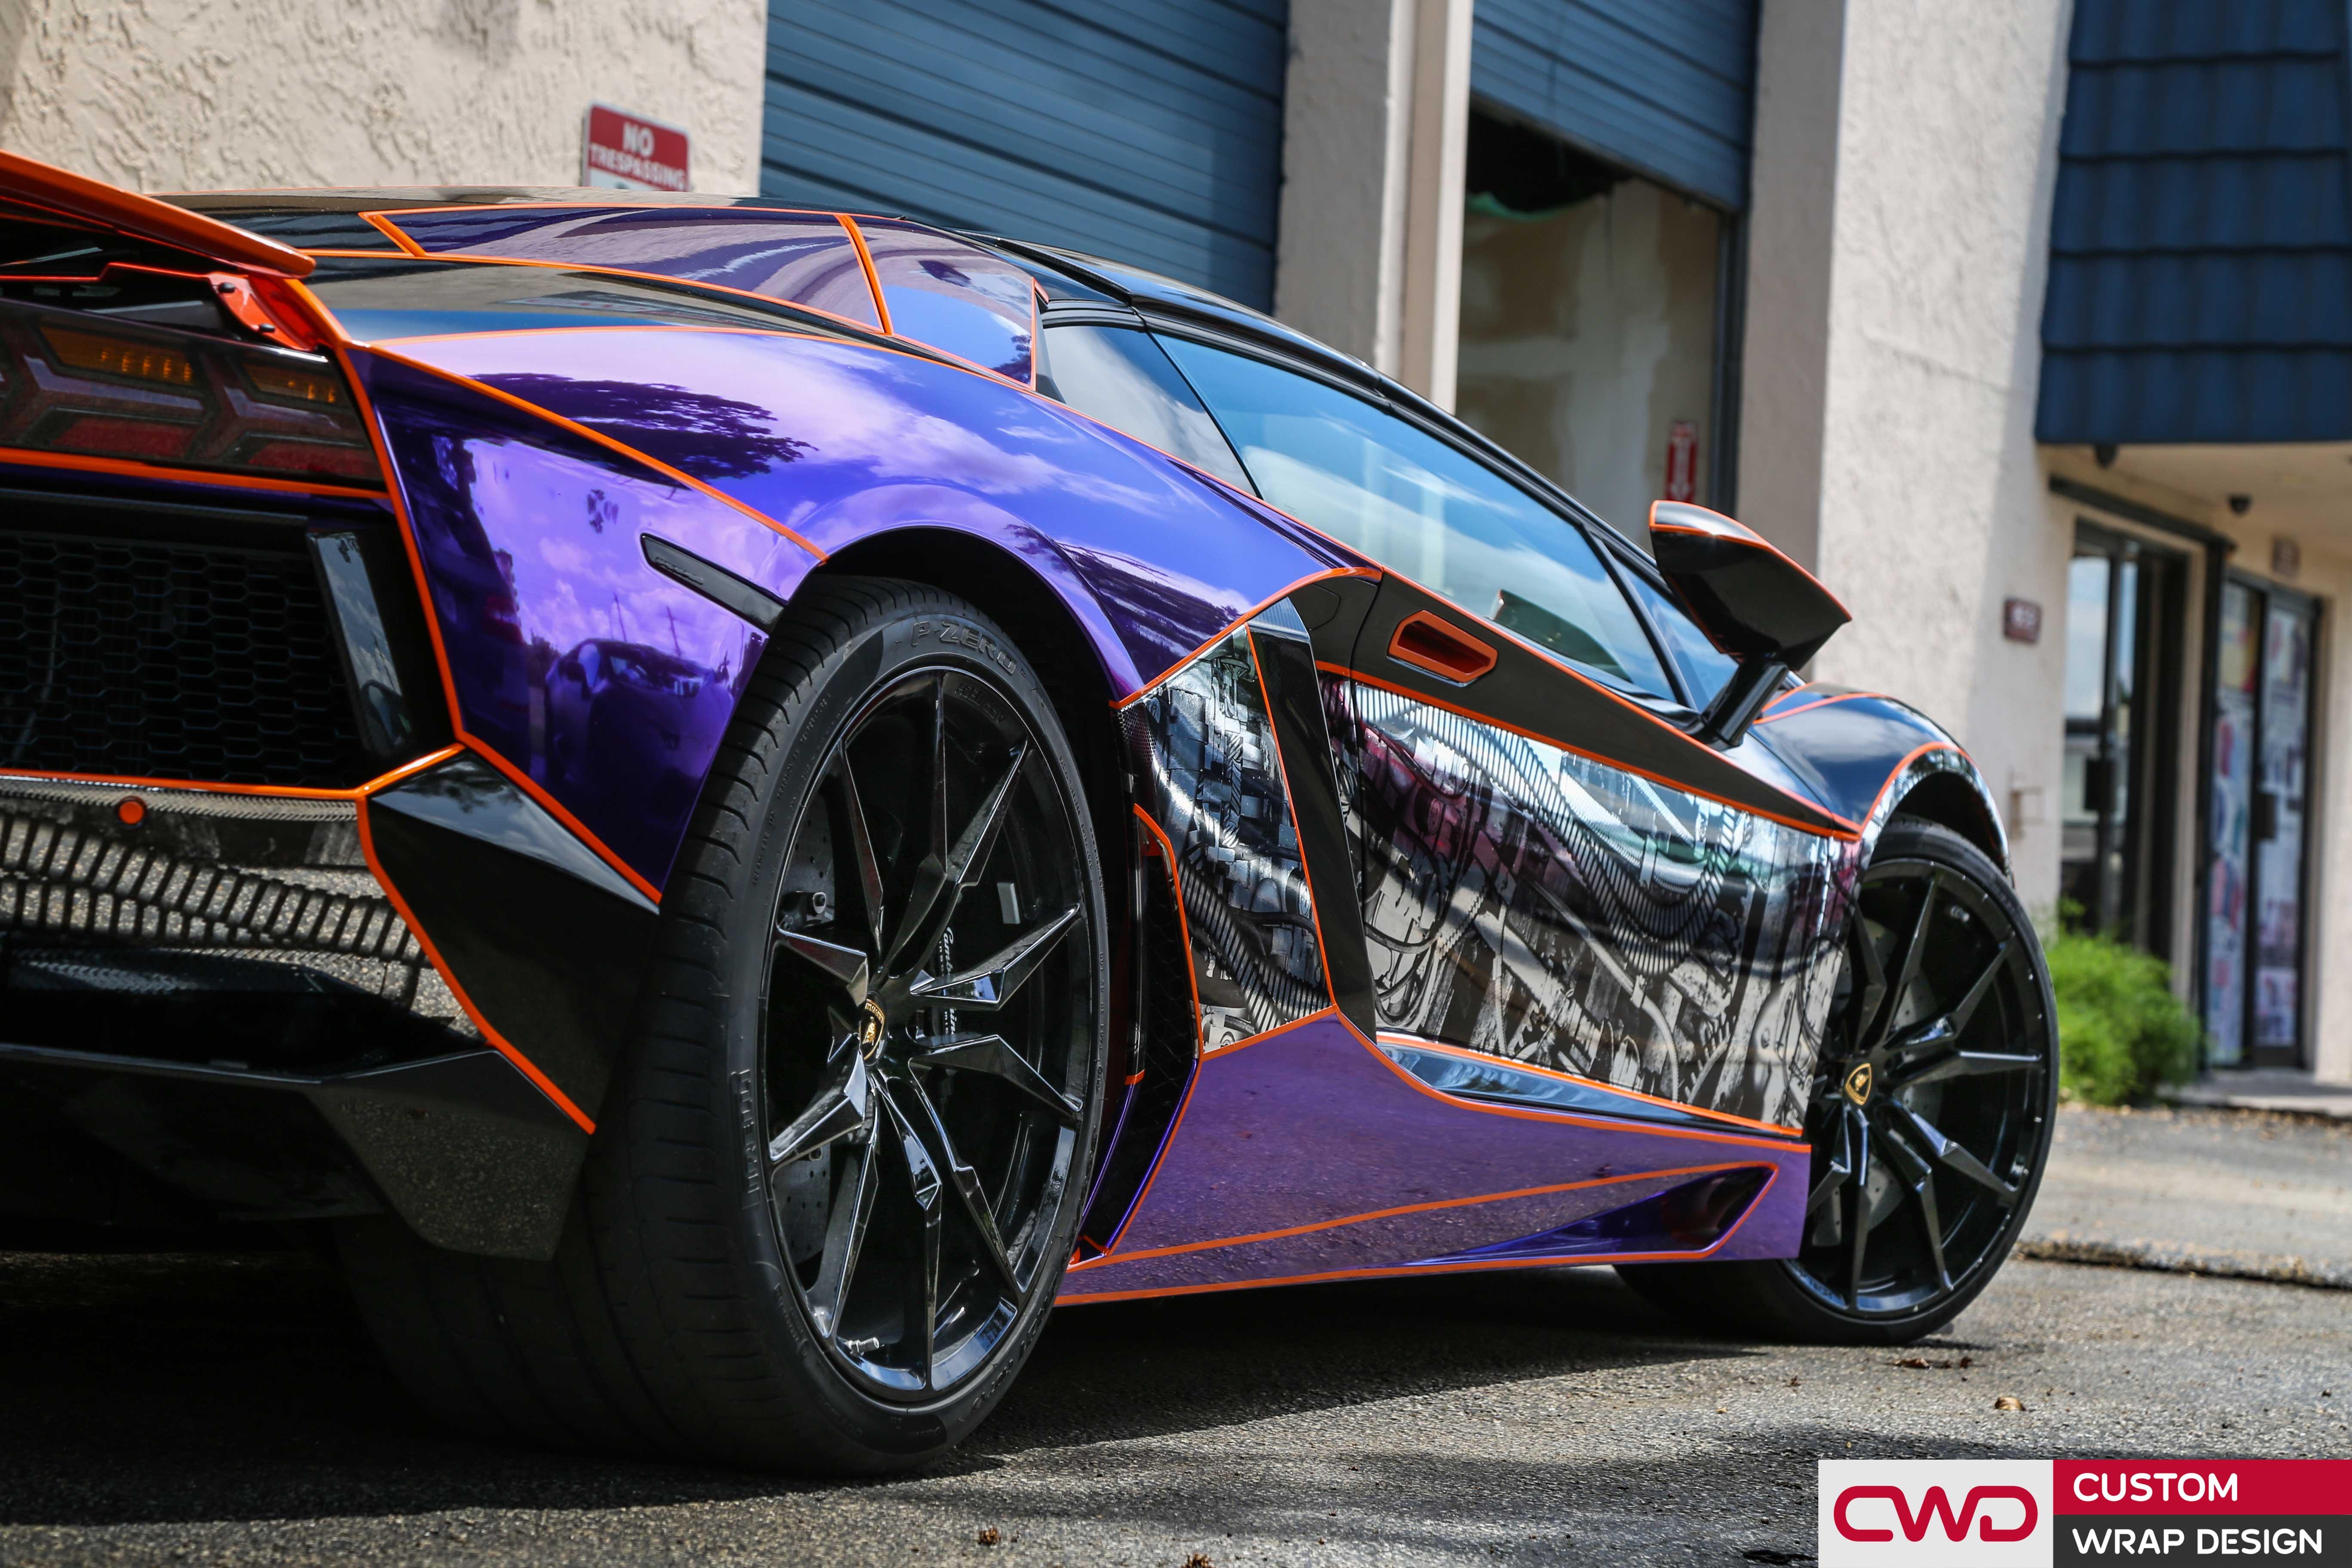 Purple Chrome Wrapped Lamborghini Aventador | CWDWRAP